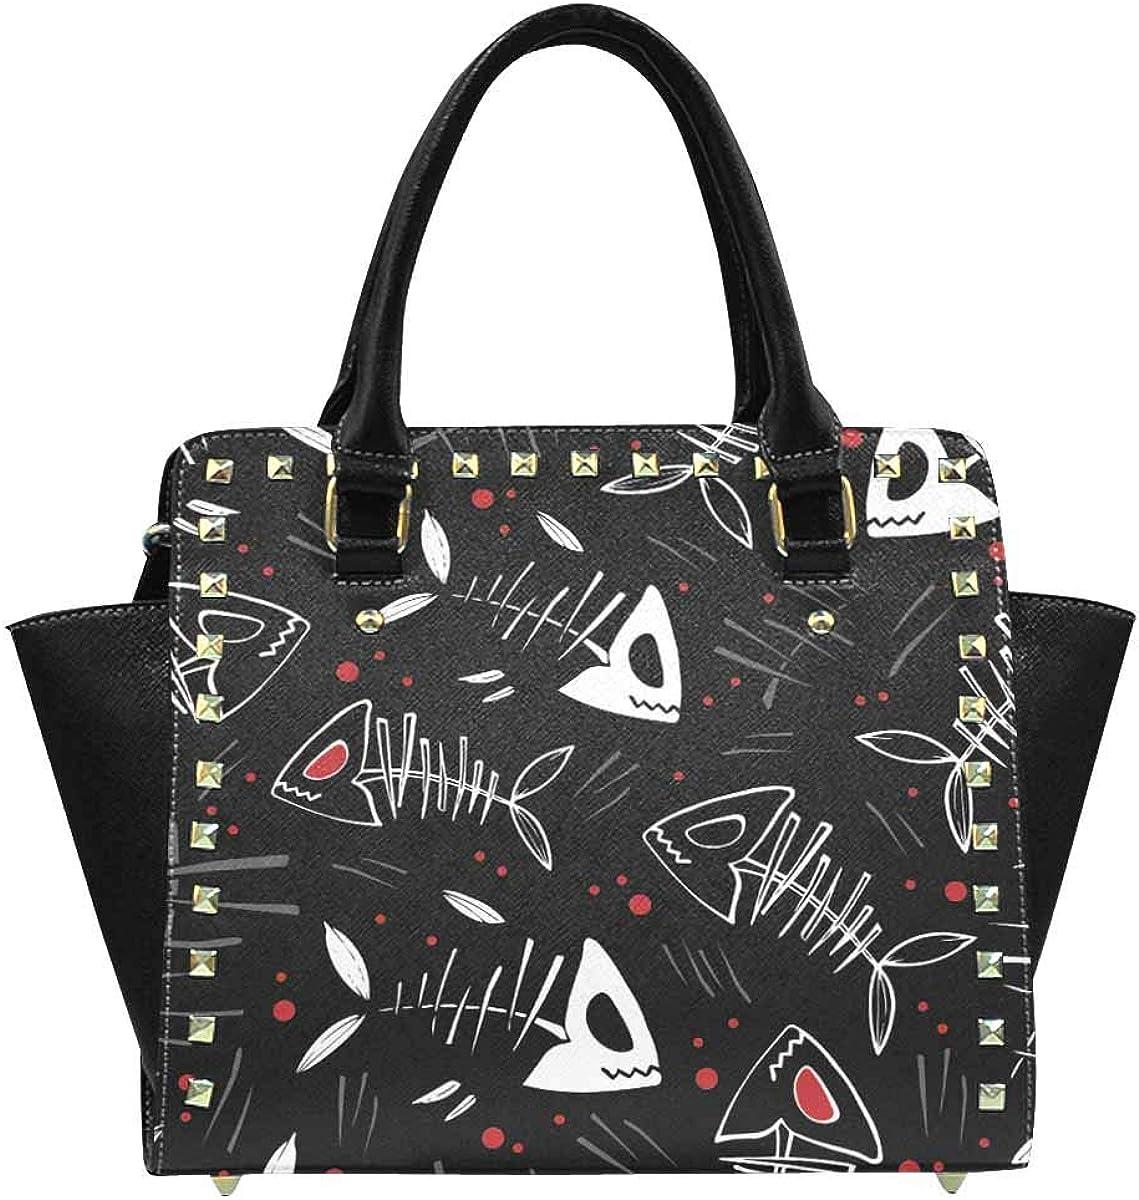 INTERESTPRINT Halloween Fish Bone Zip Tote Shoulder Handbag Hobo Crossbody Bag